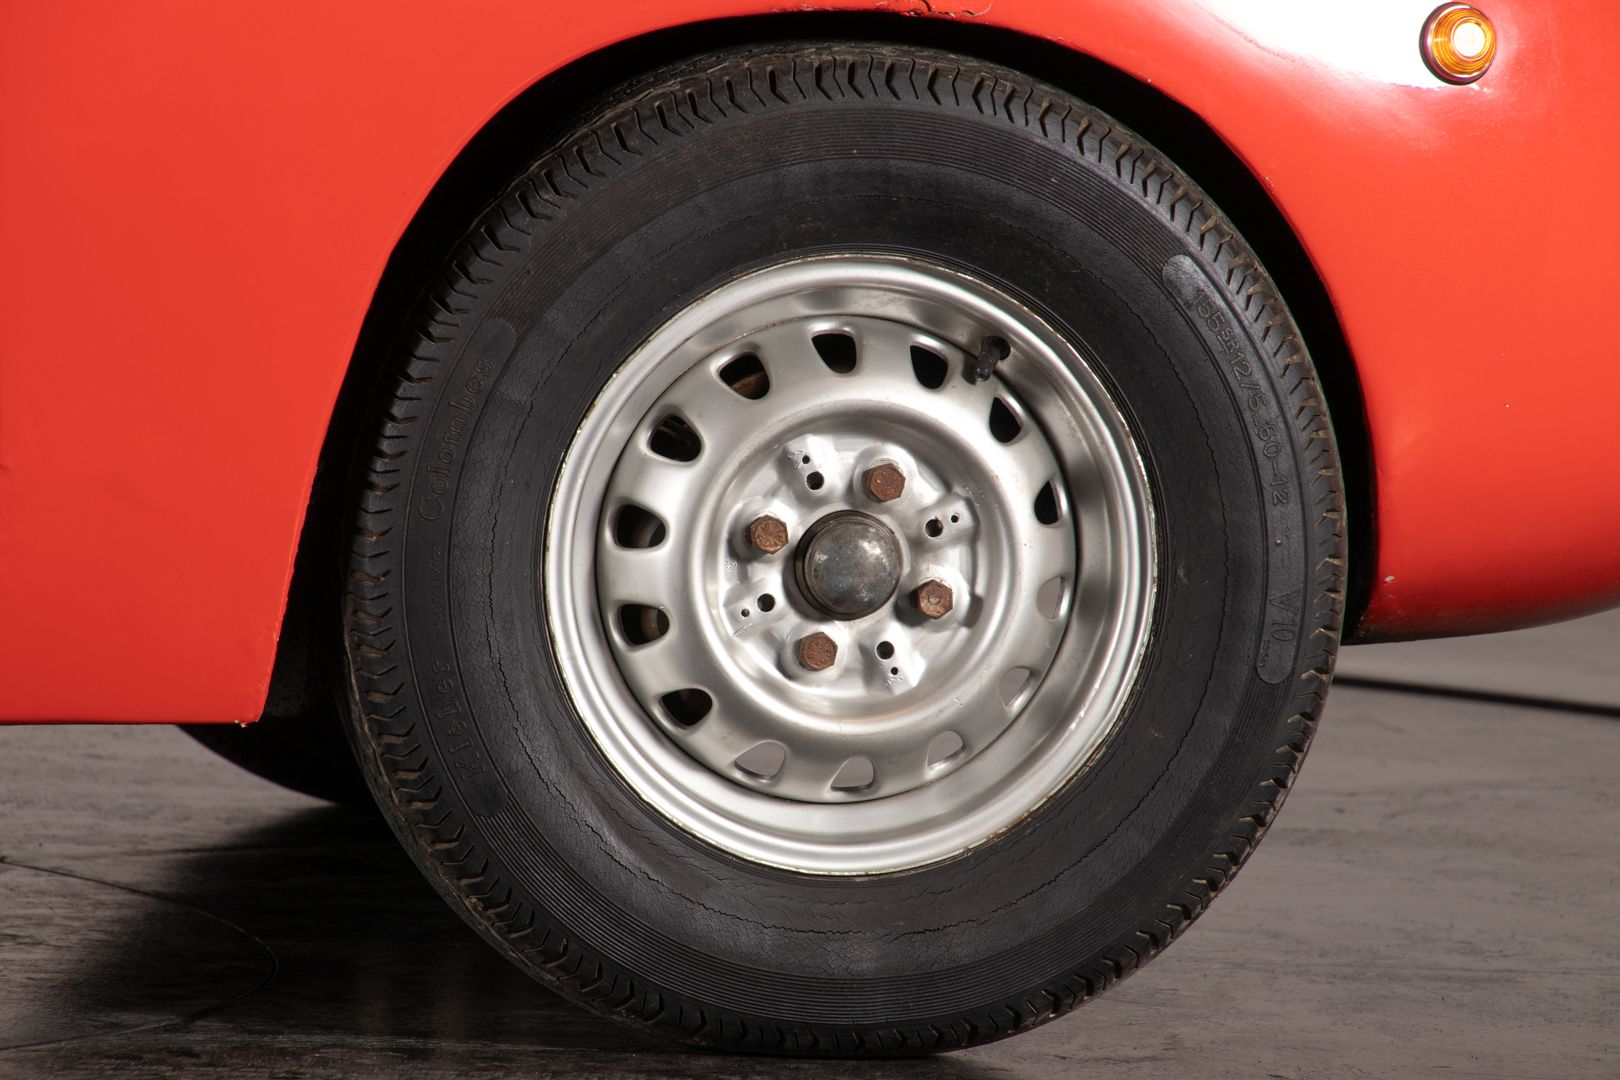 1960 Fiat Abarth 750 Bialbero record Monza 33313